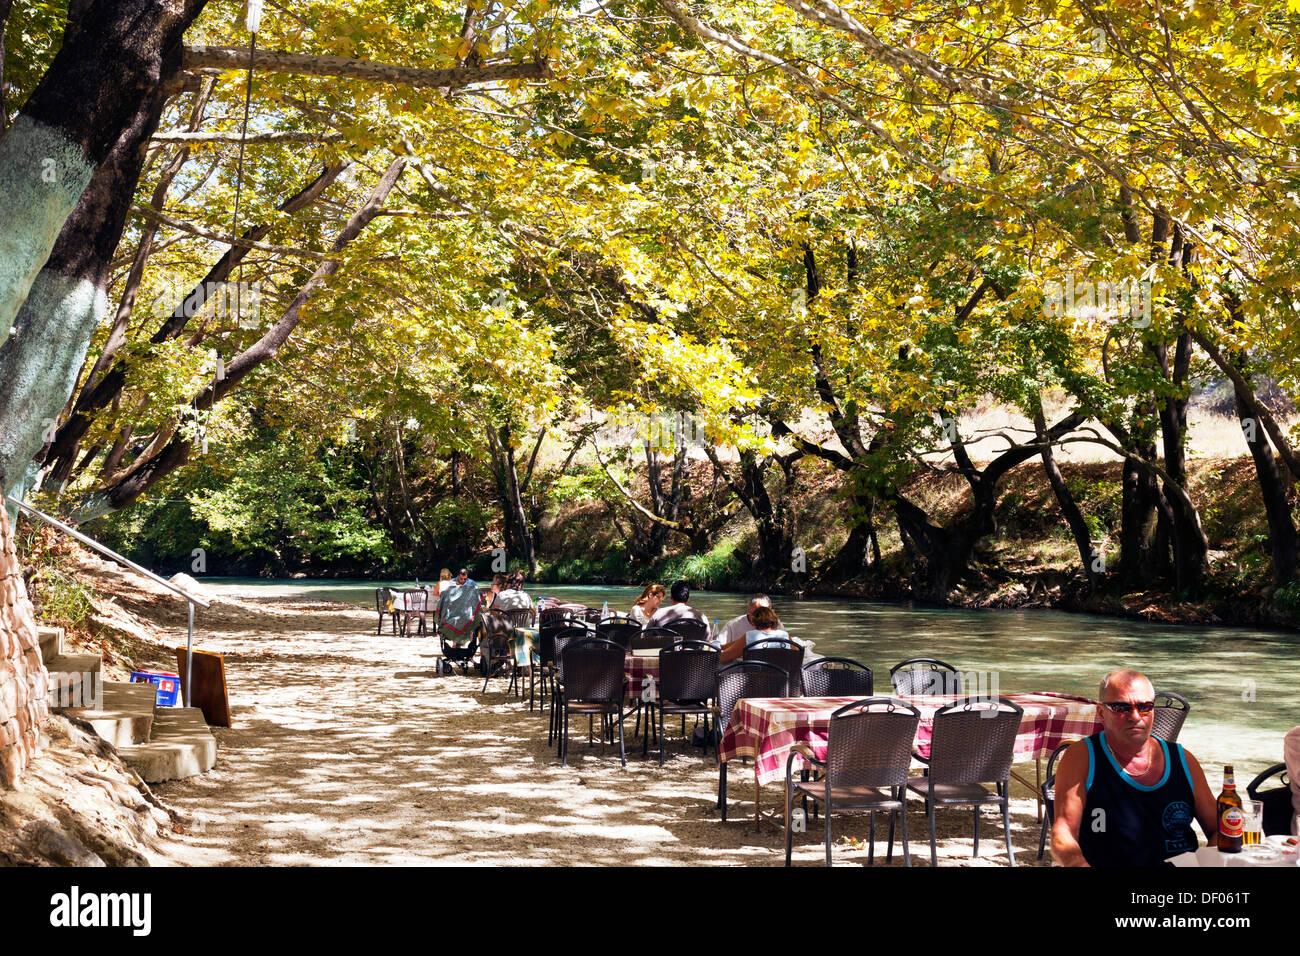 Mainland river diners eating at taverna at riverside under trees Greek Island Greece - Stock Image